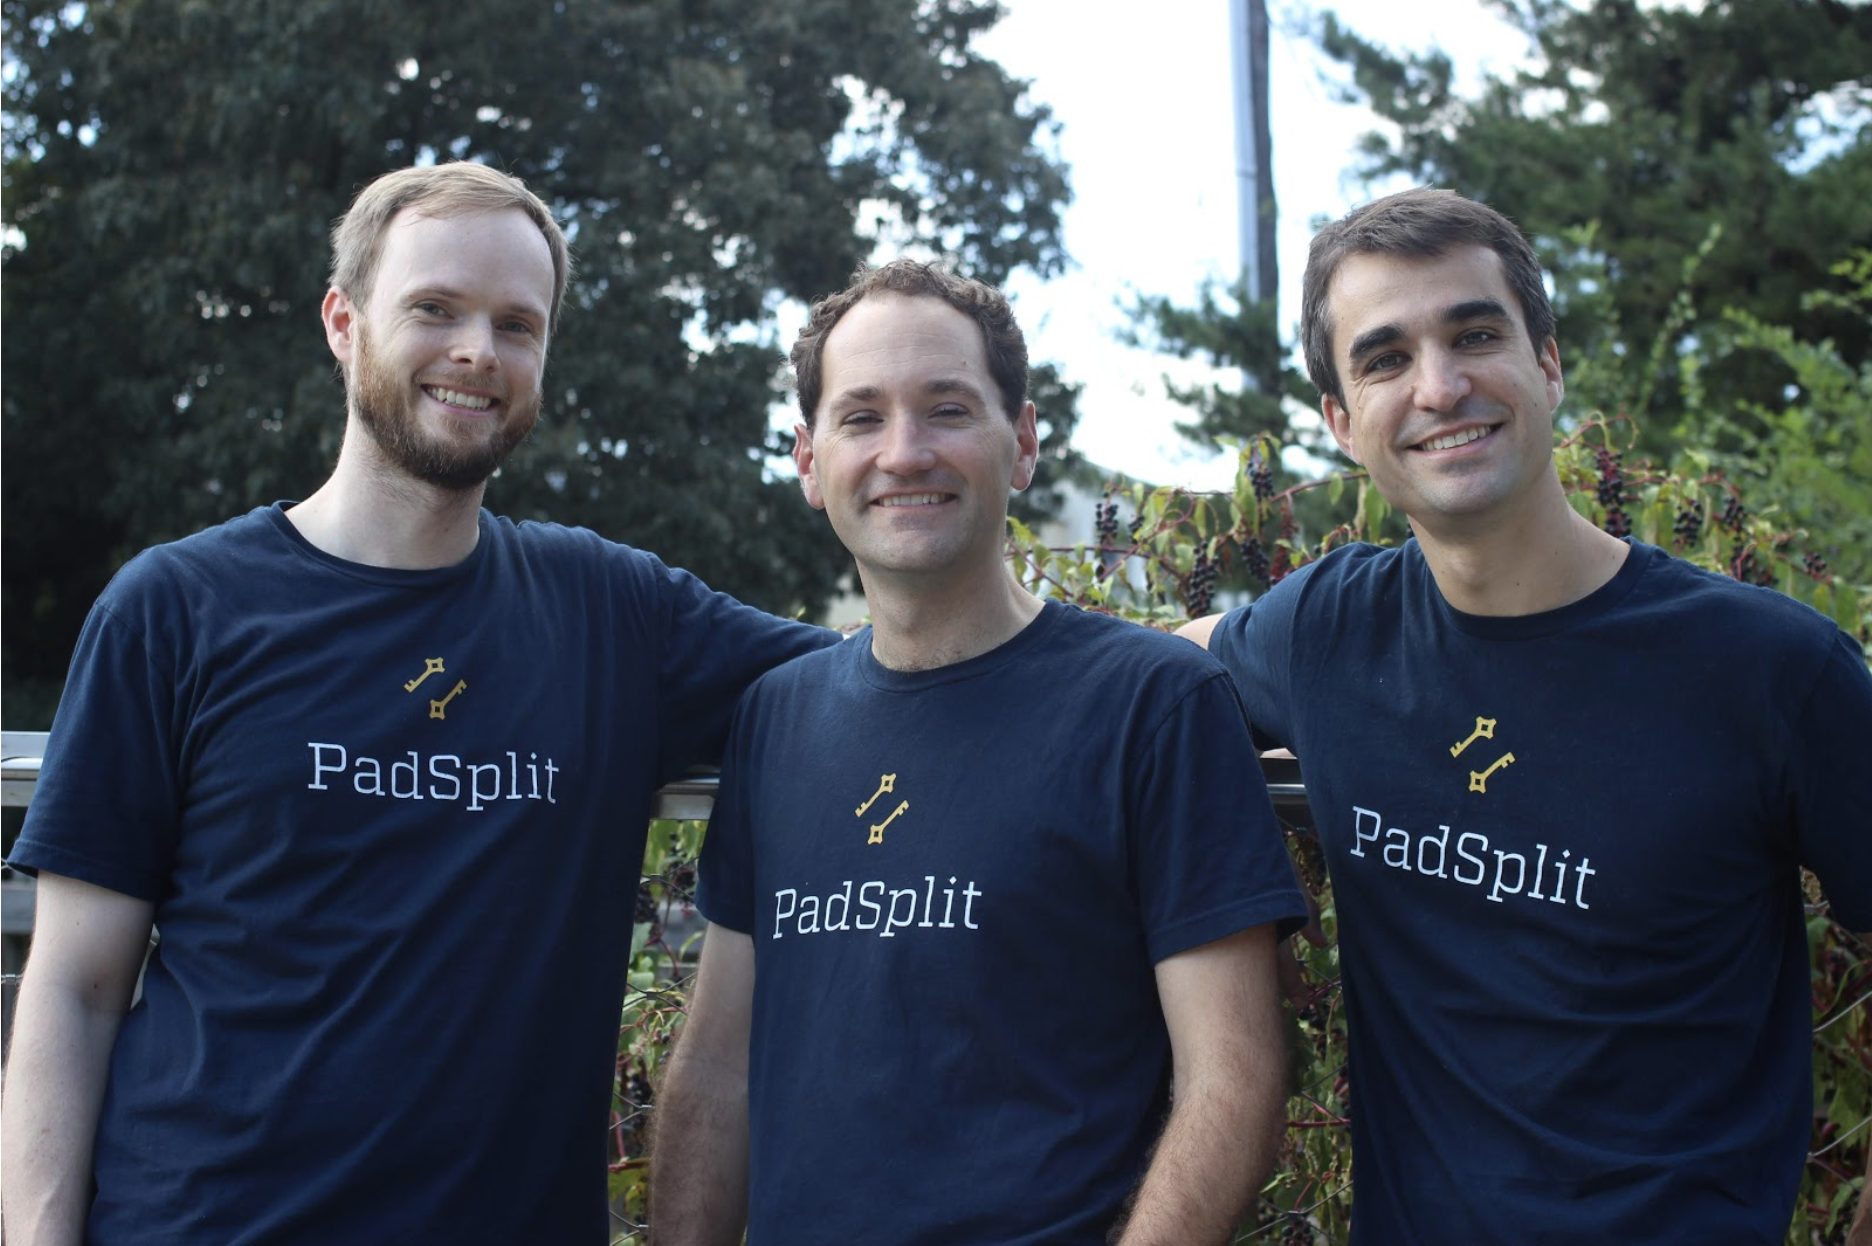 Padsplit founders MetaProp PropTech